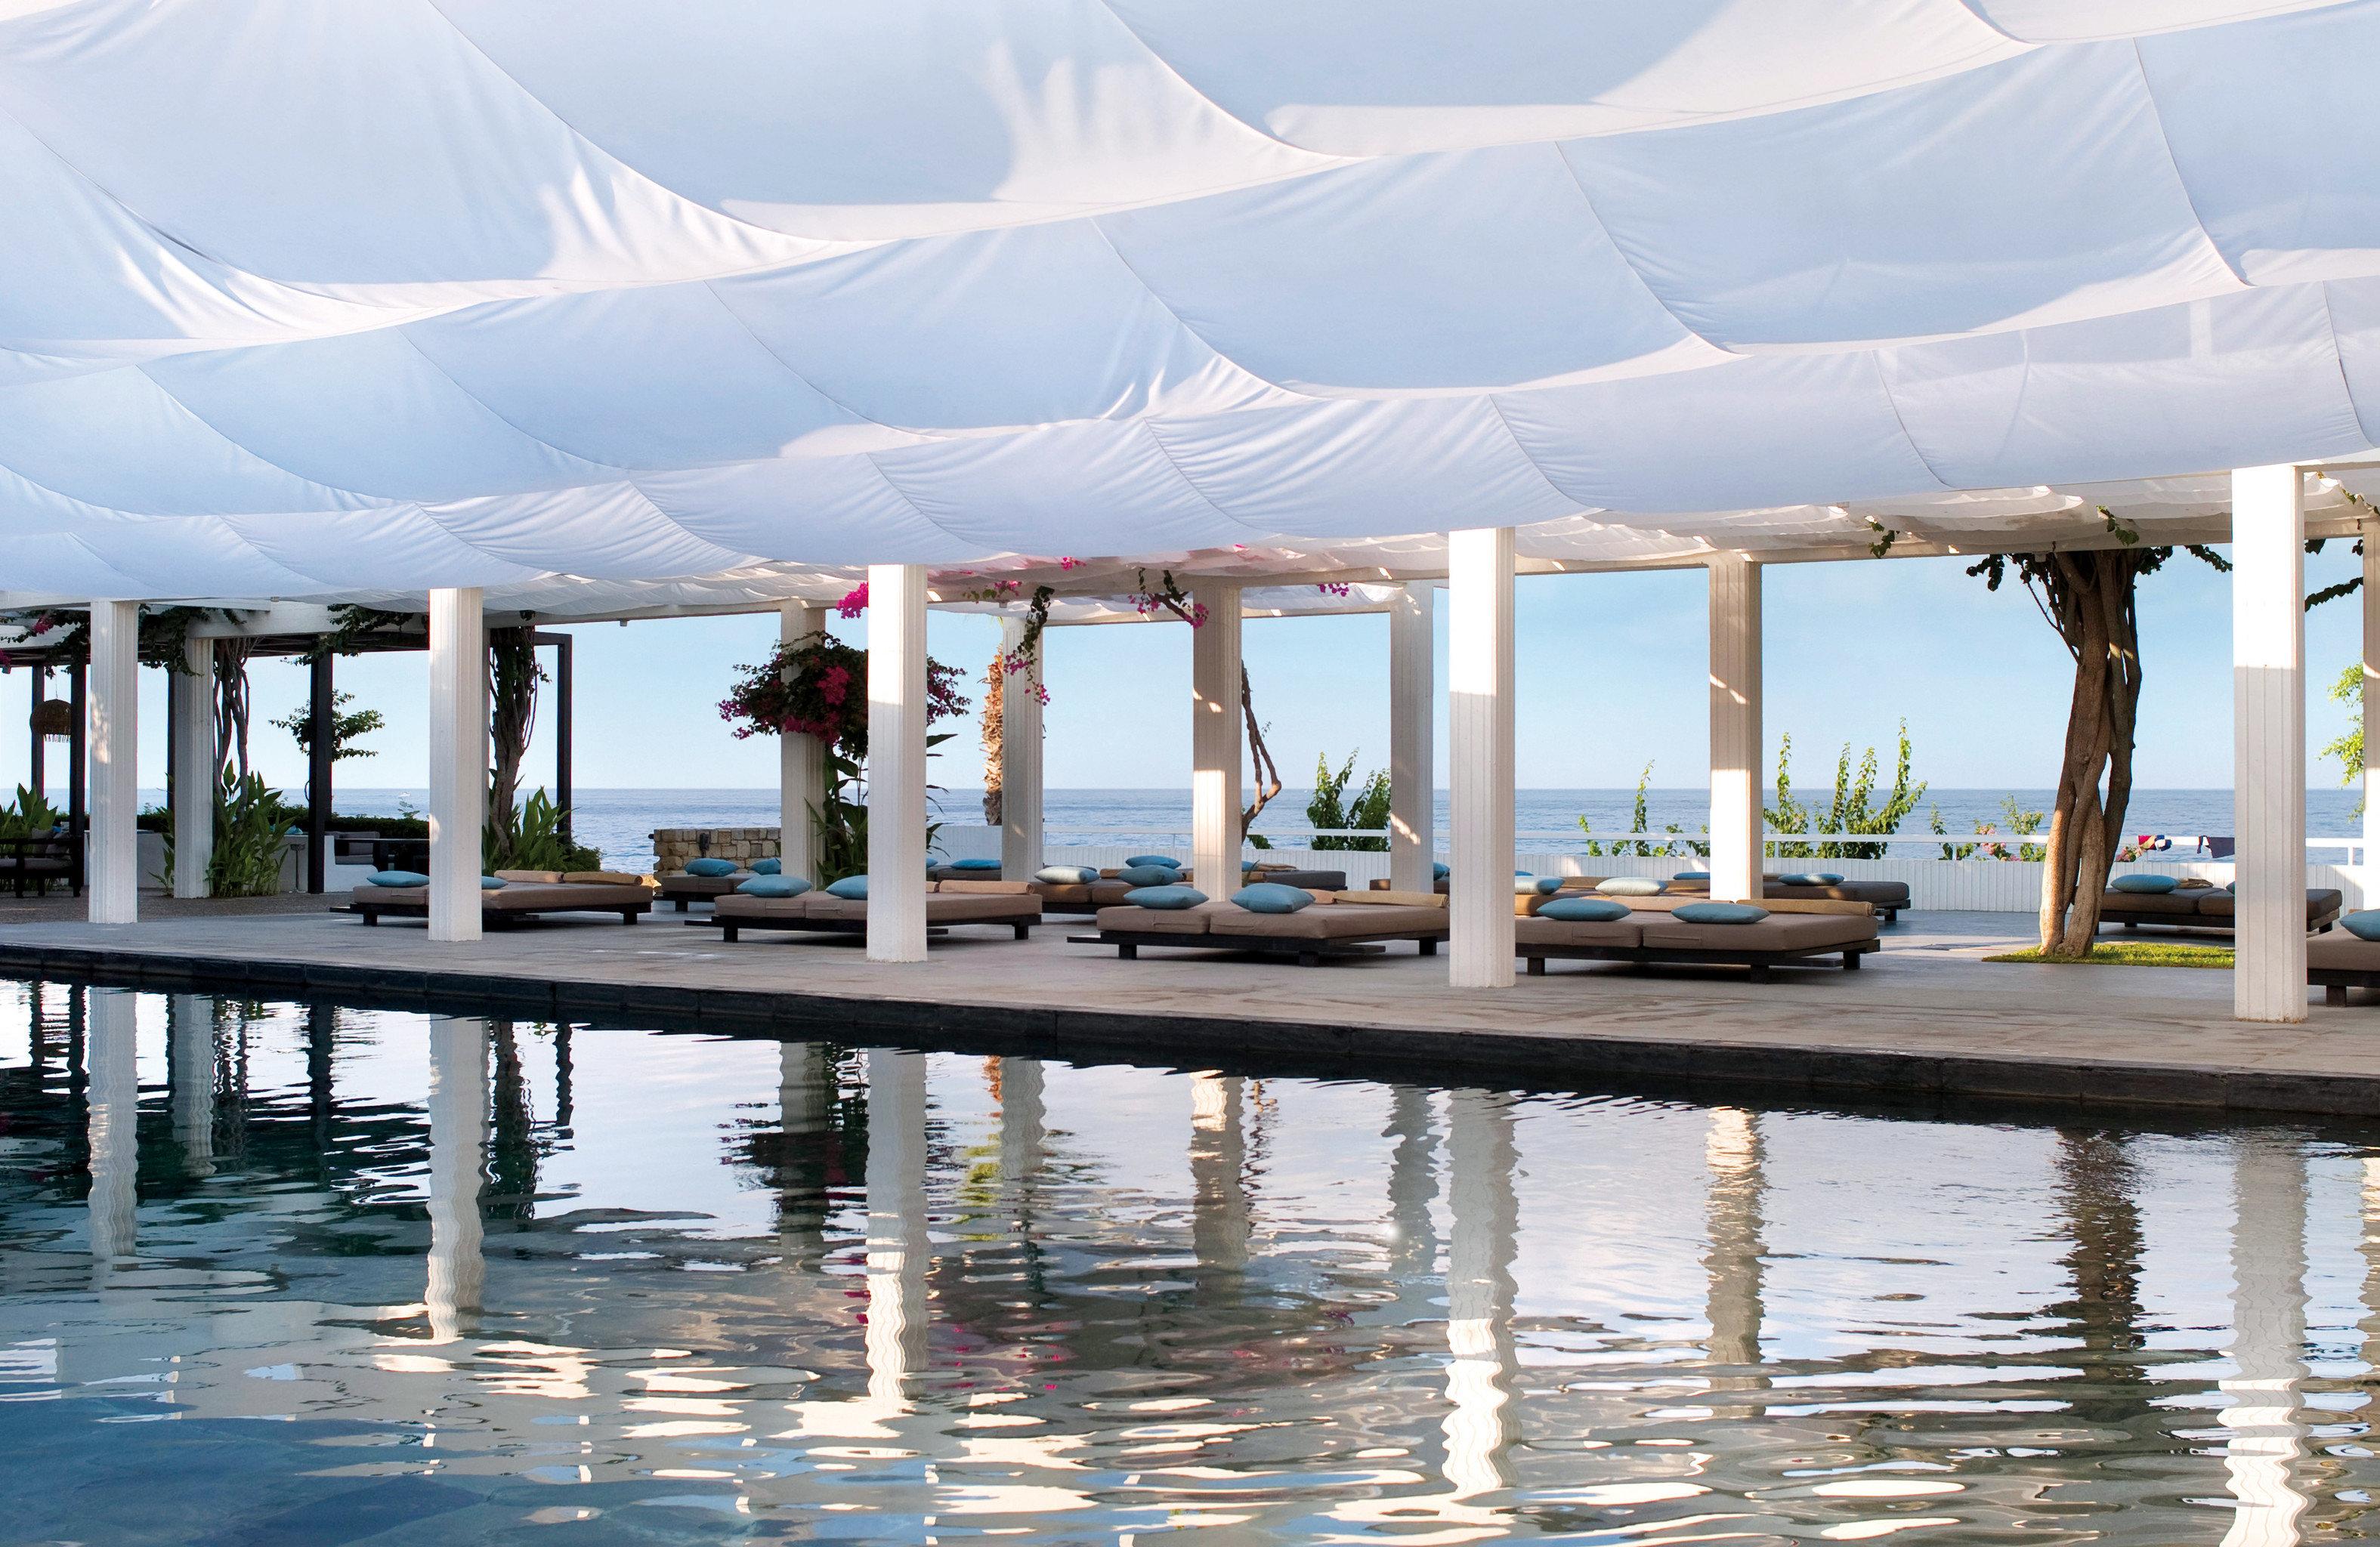 Elegant Family Island Lounge Outdoors Patio Pool Waterfront leisure Resort water swimming pool marina dock Sea